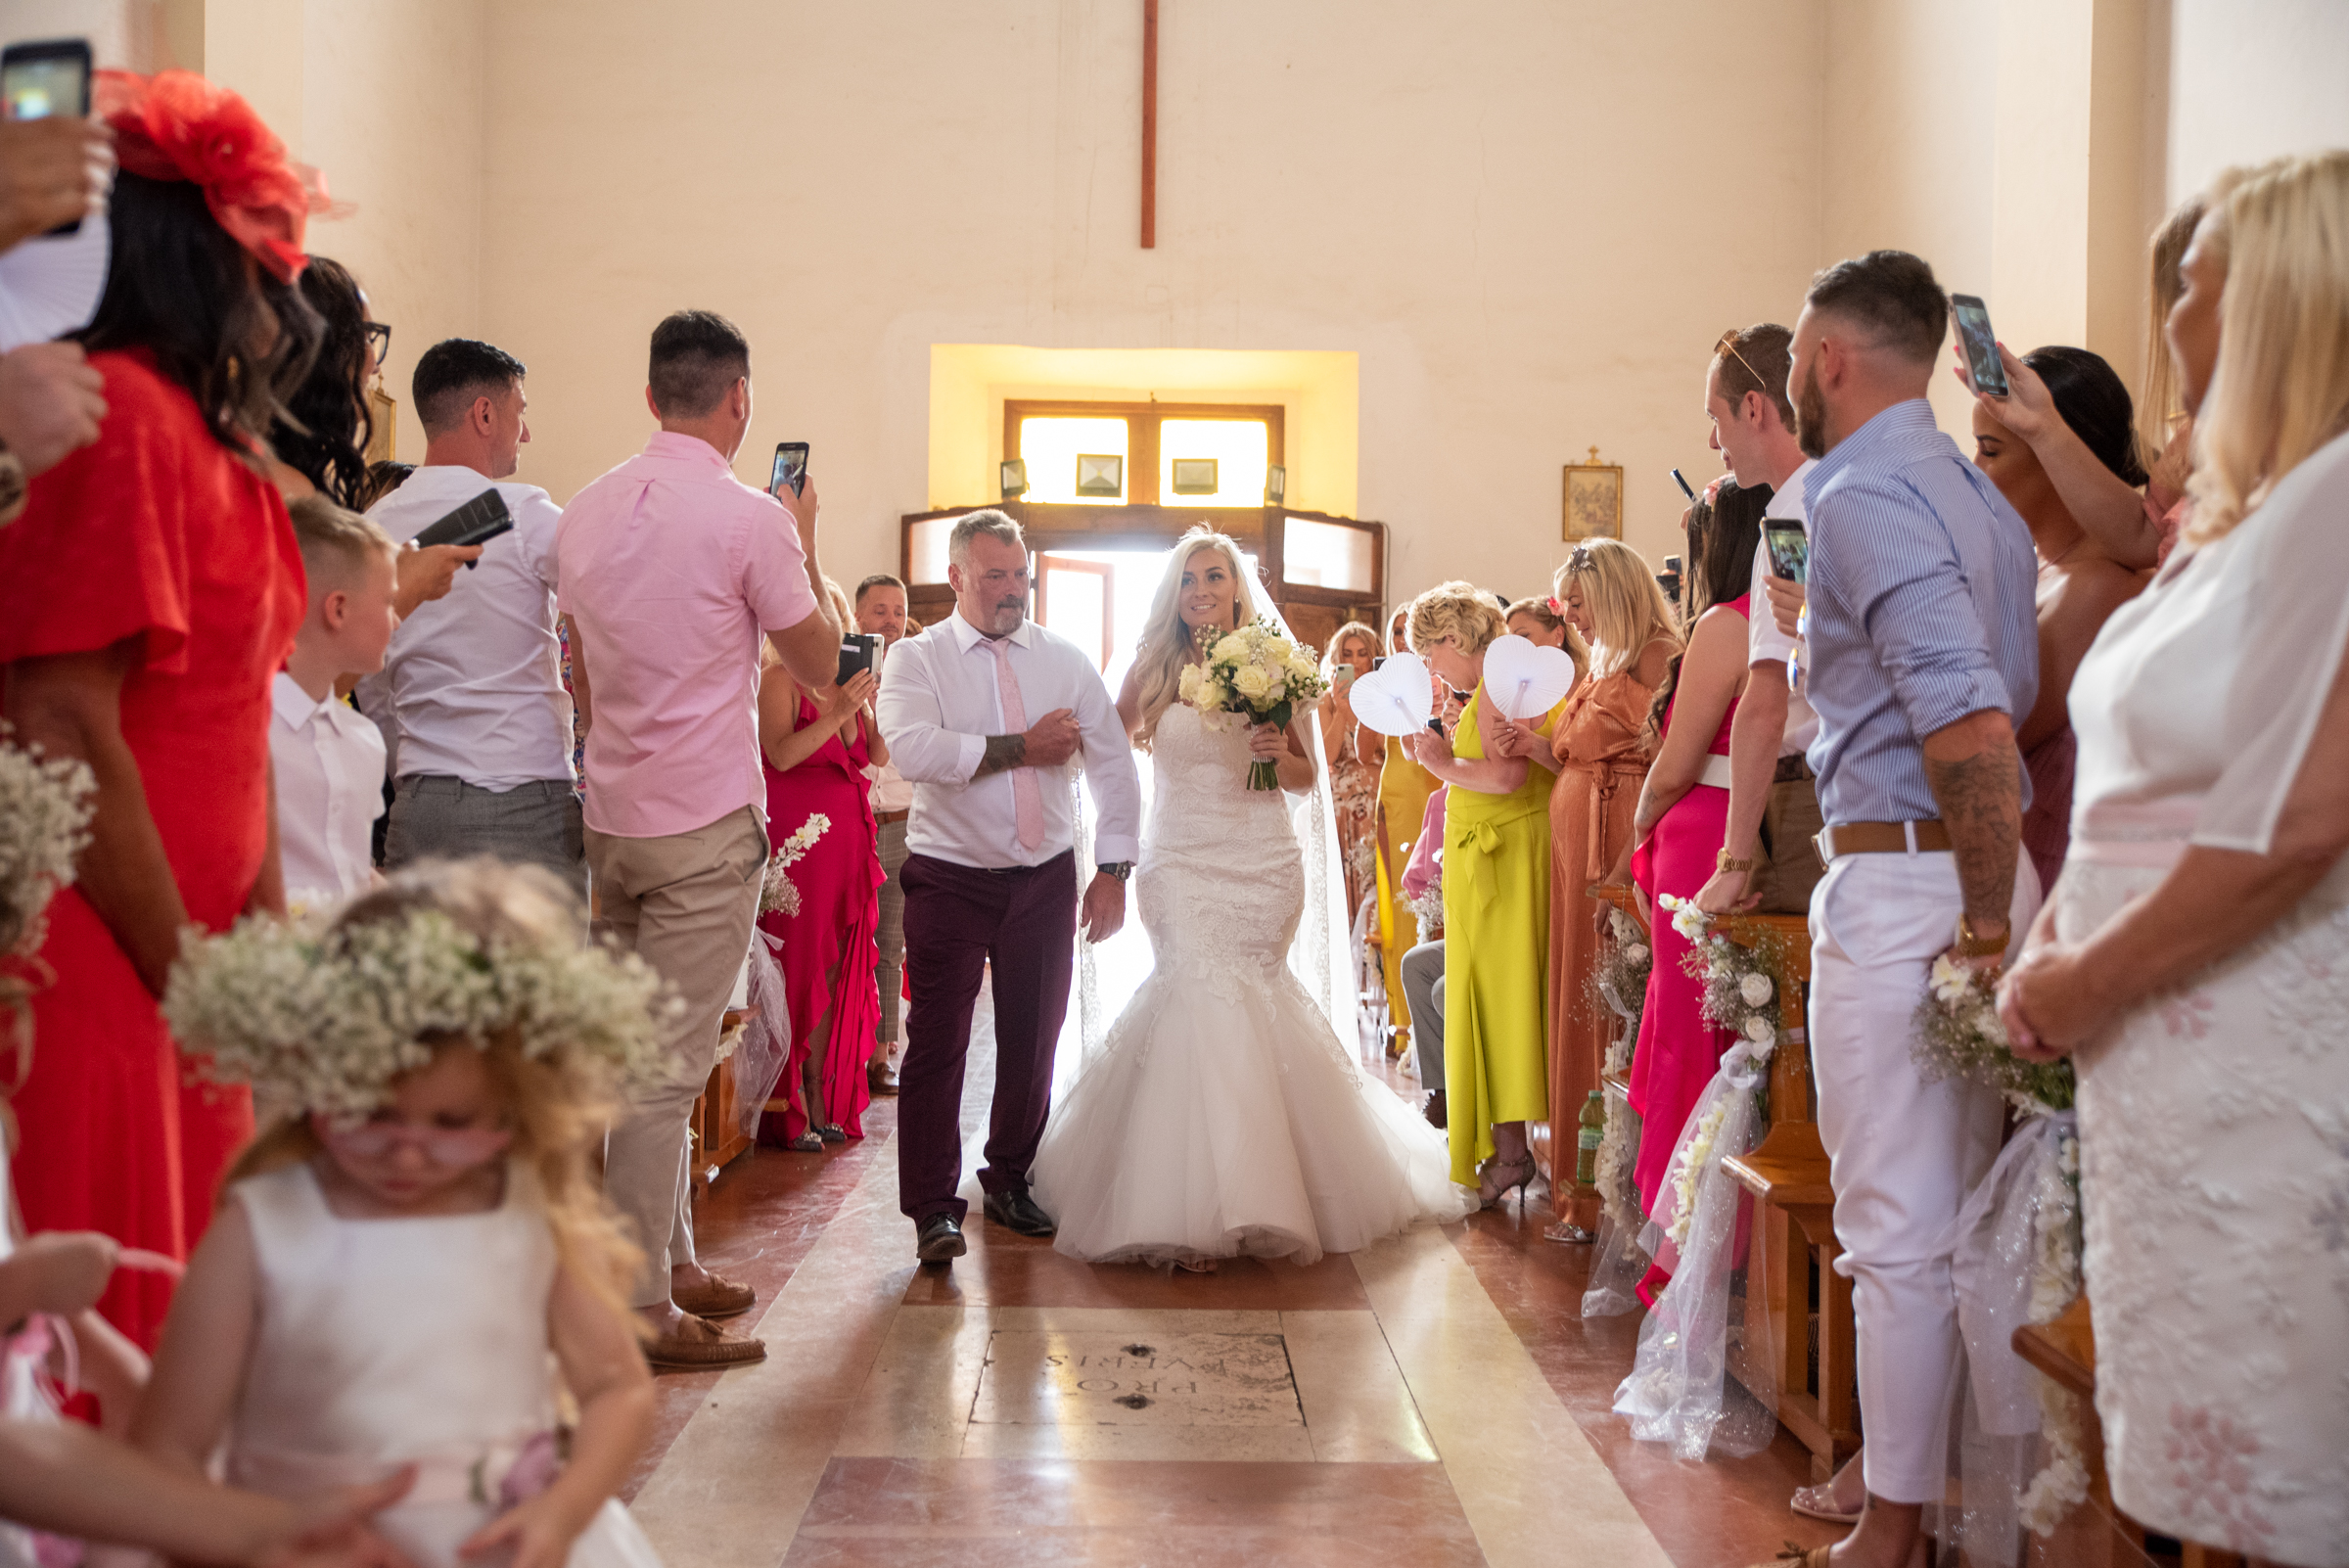 Borgo di tragliata Wedding-18.jpg